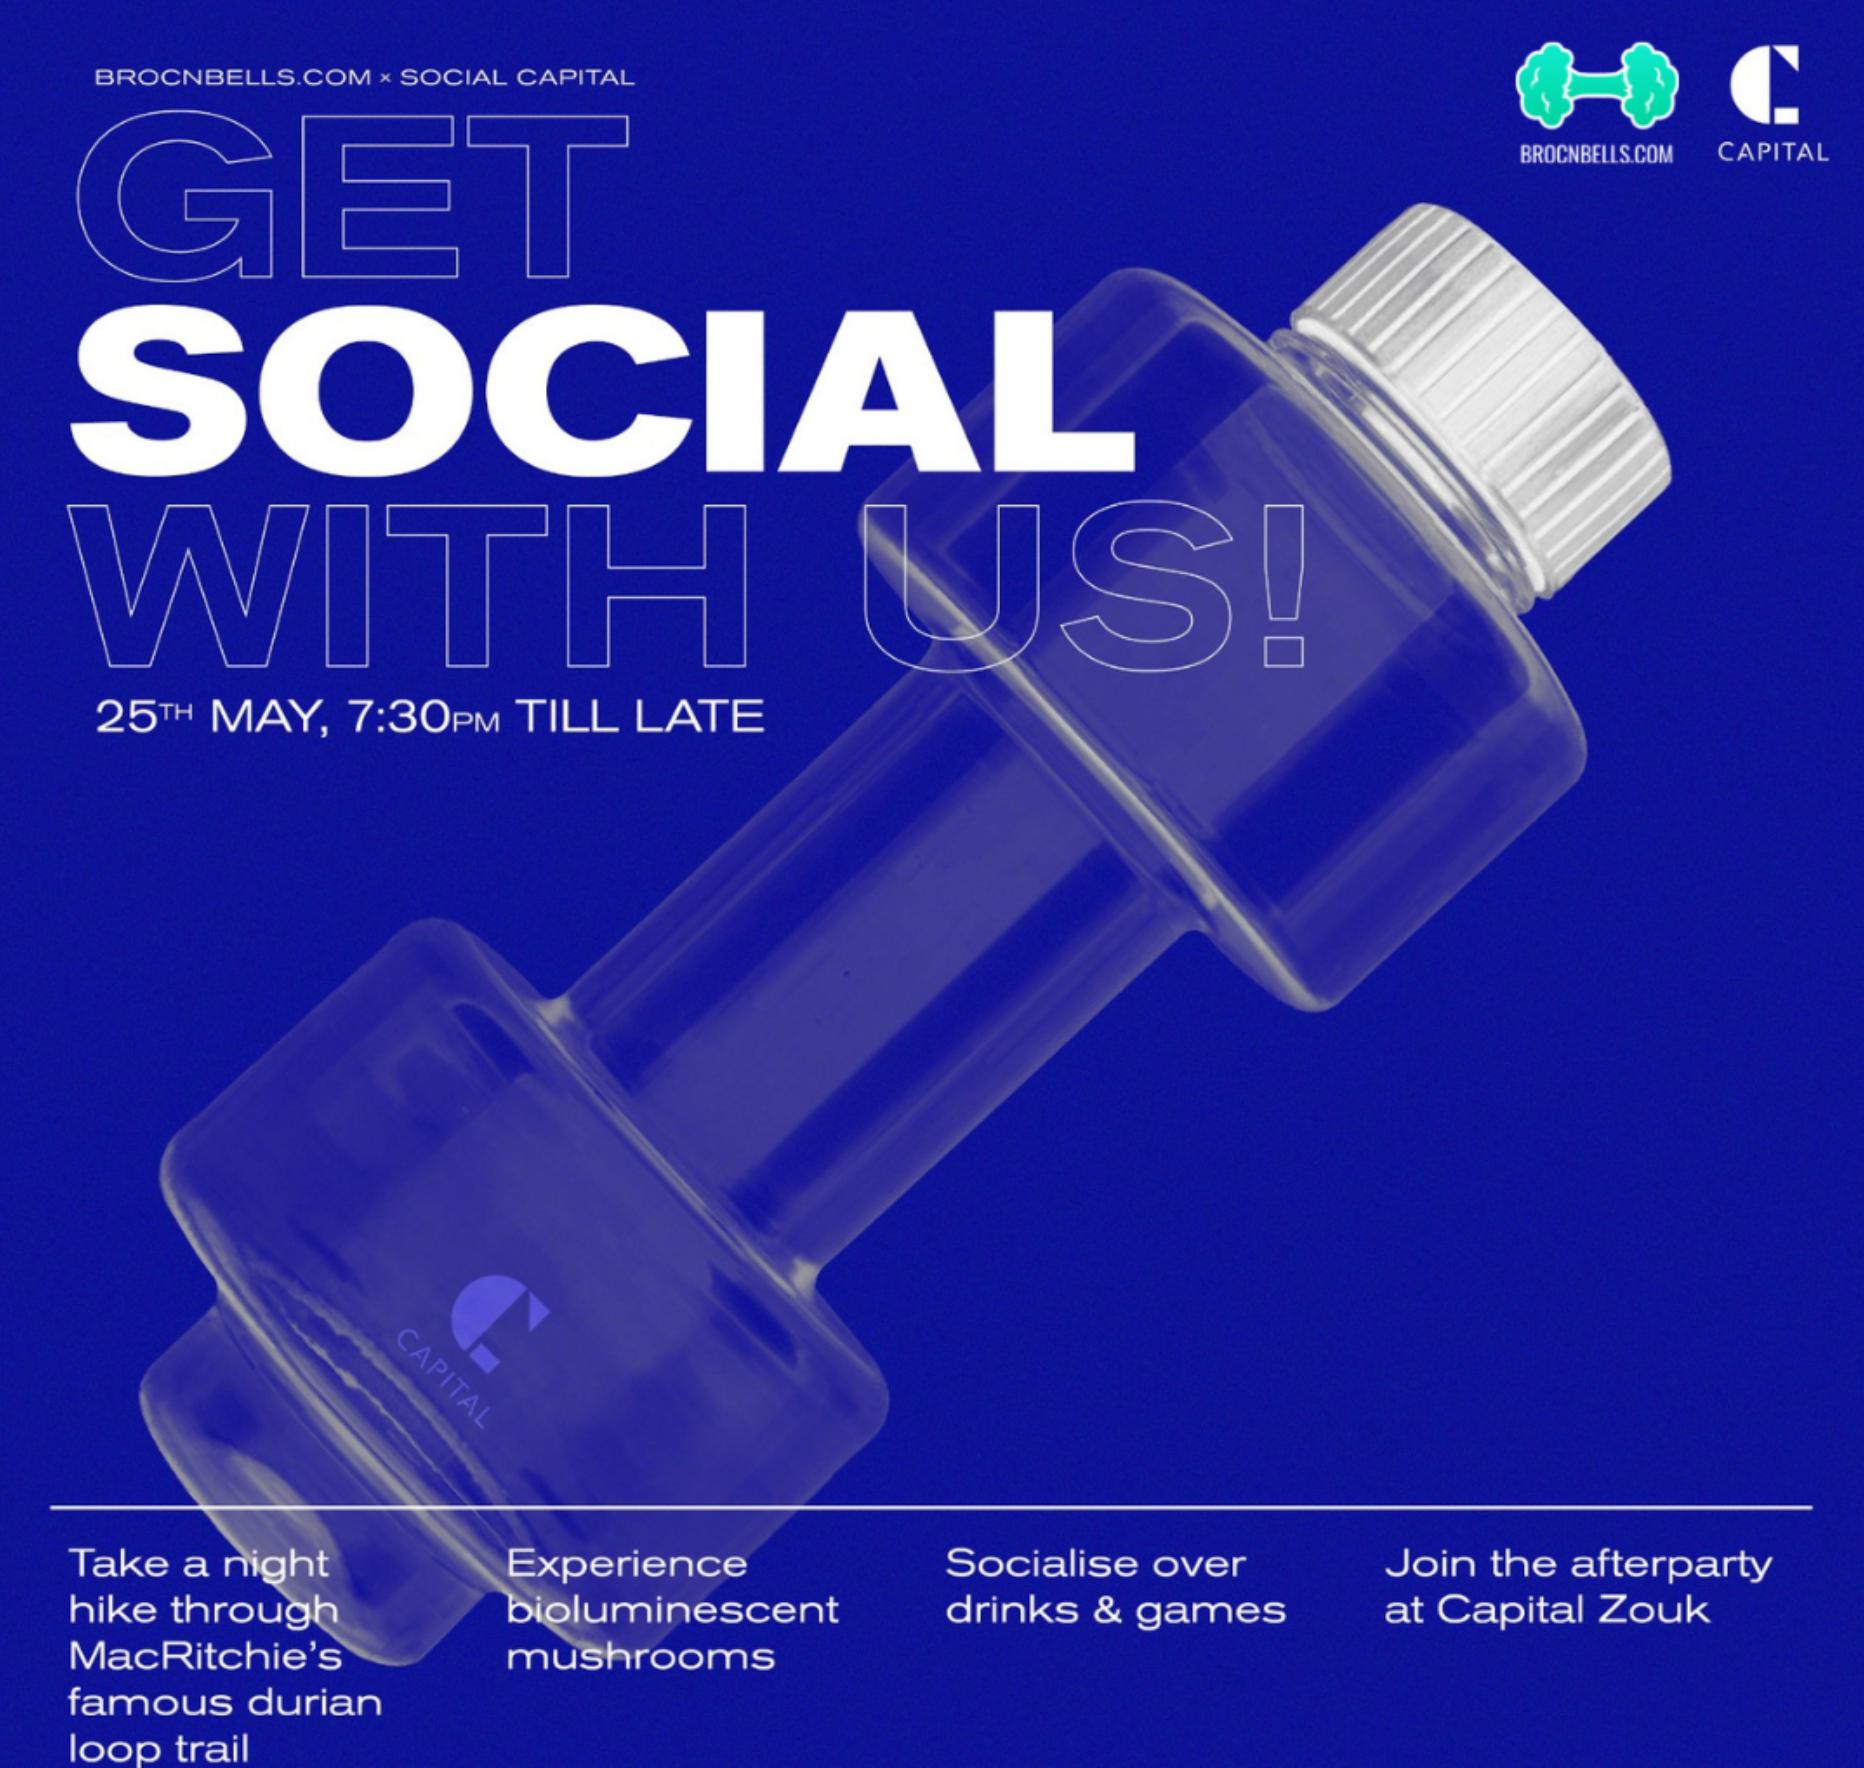 BrocnBells_SocialCapital